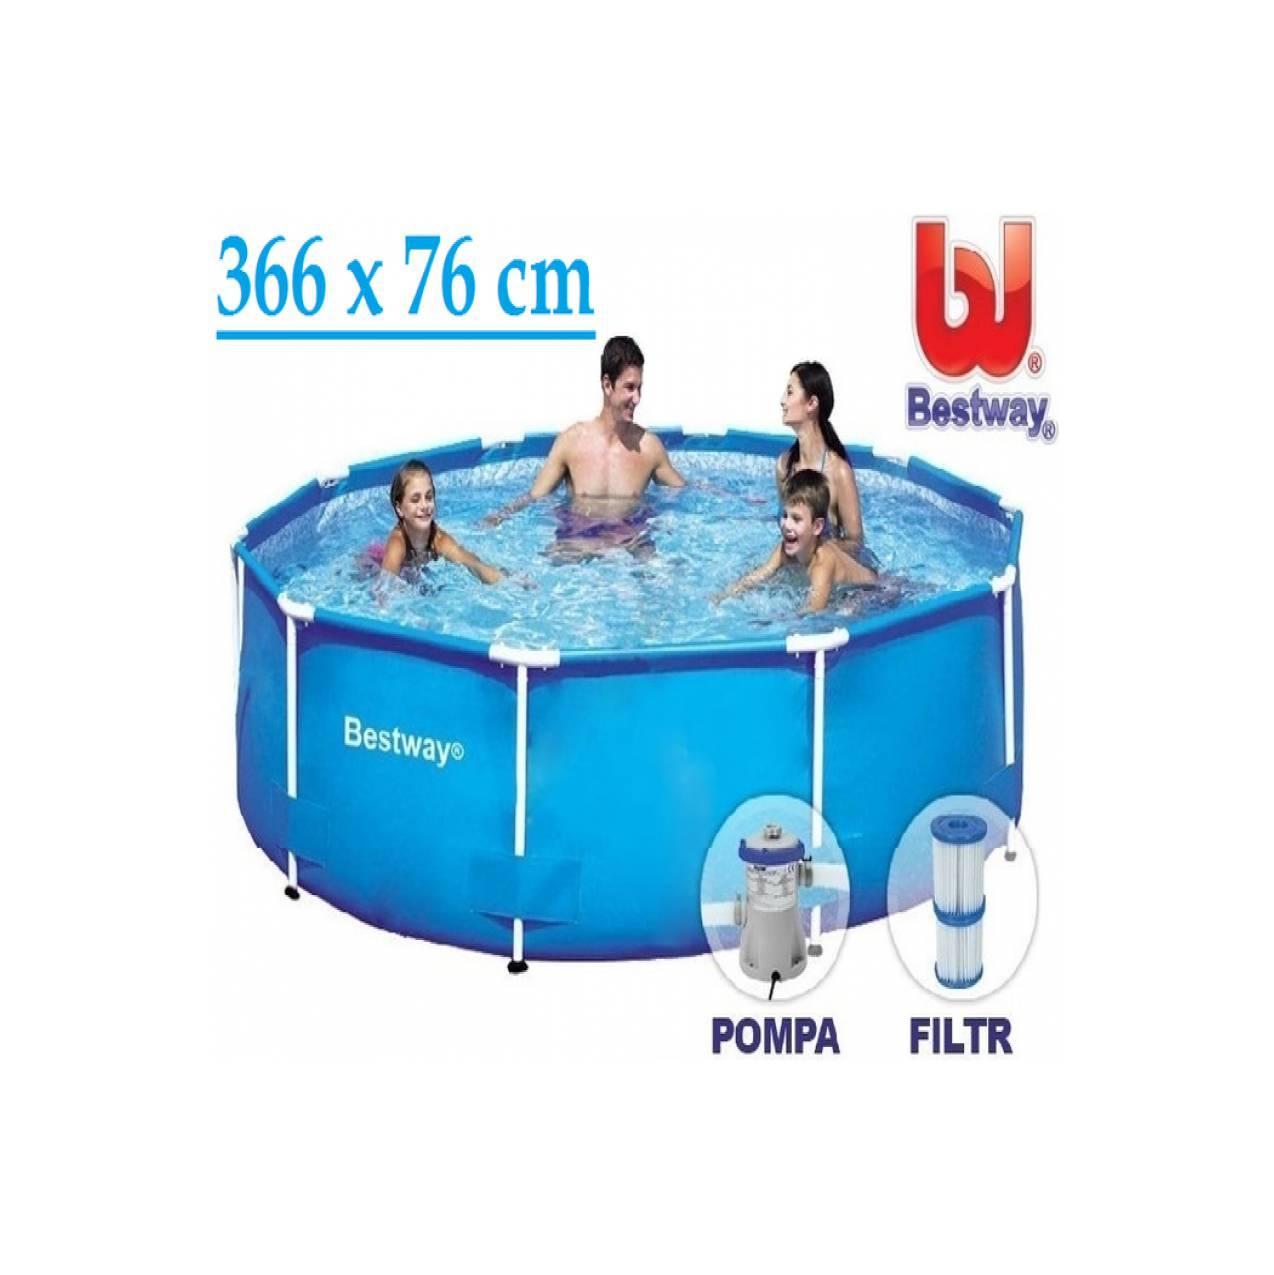 Bestway Steel Pro Frame Pool Set 366cm. Kolam Renang & Filter 56416